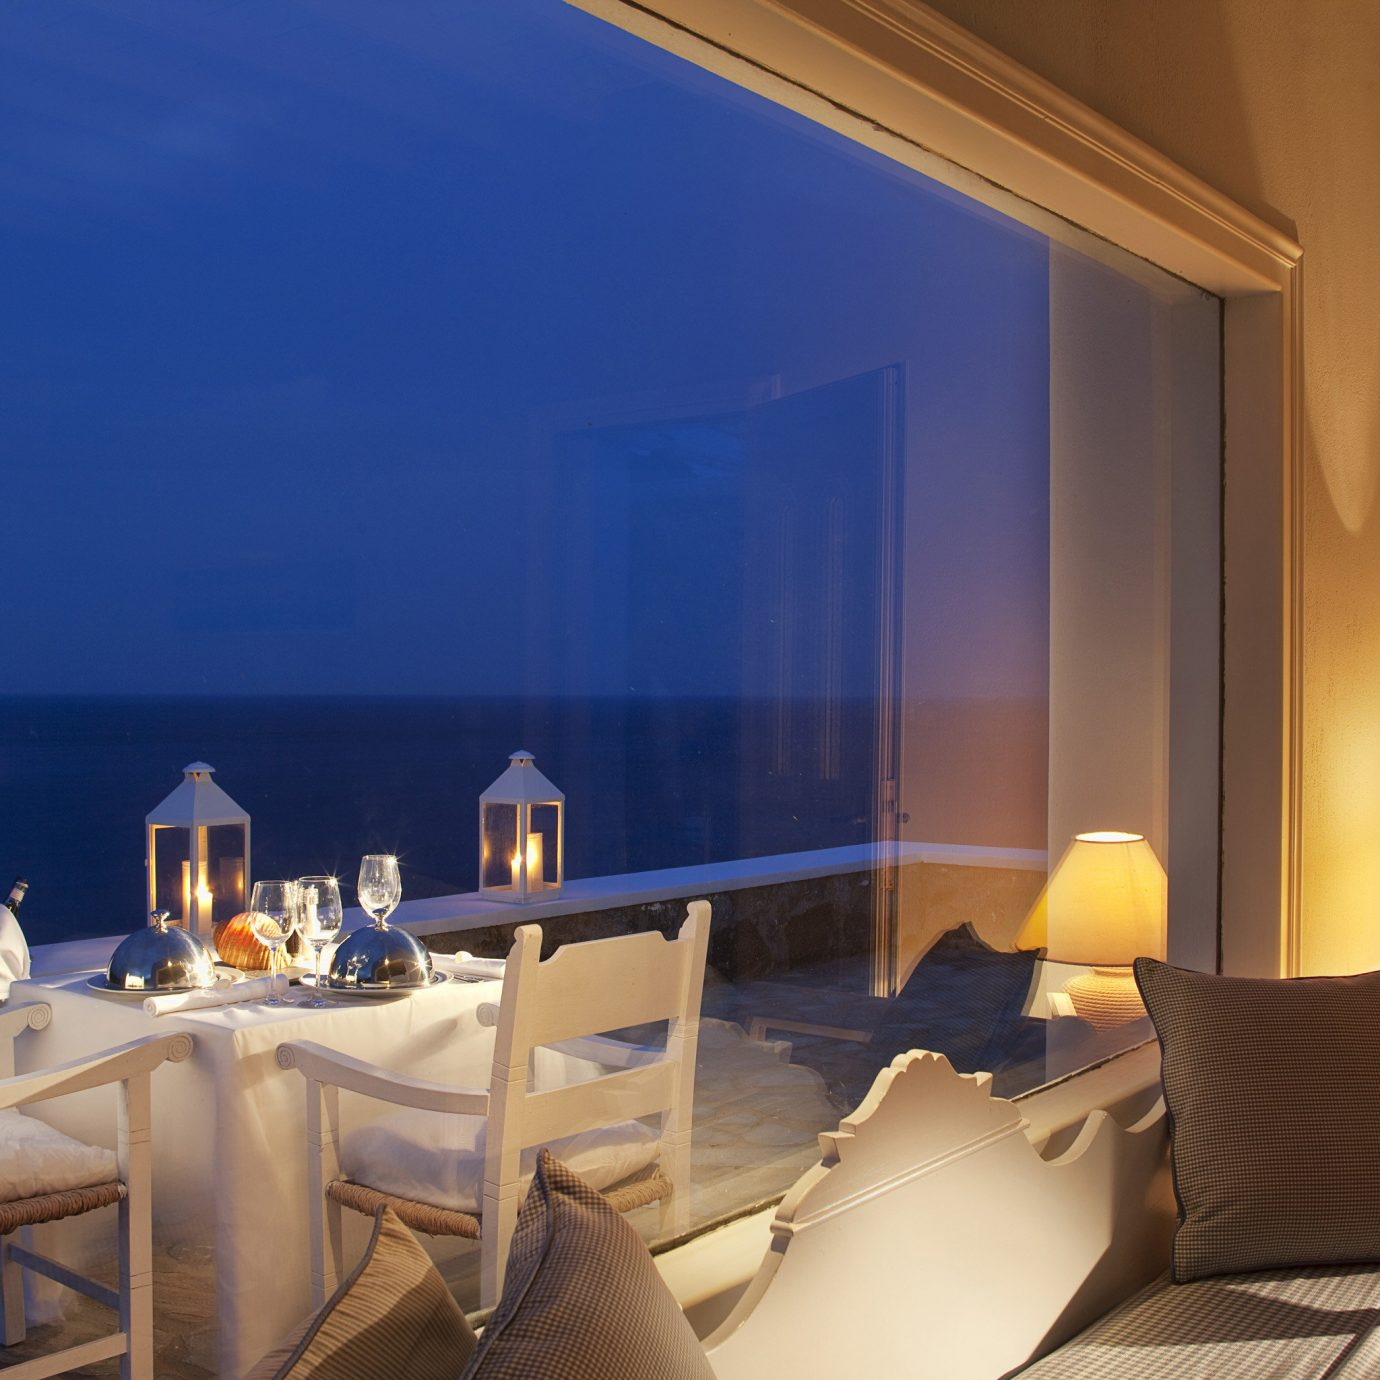 Balcony Beachfront Bedroom Dining Honeymoon Island Romance Scenic views Suite Waterfront property lighting living room restaurant